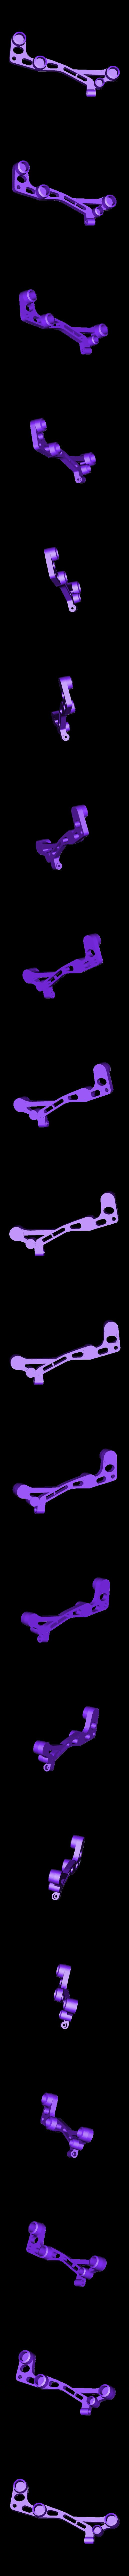 left.stl Download free STL file FPV kit for Turnigy 9XR • 3D print model, 3dxl